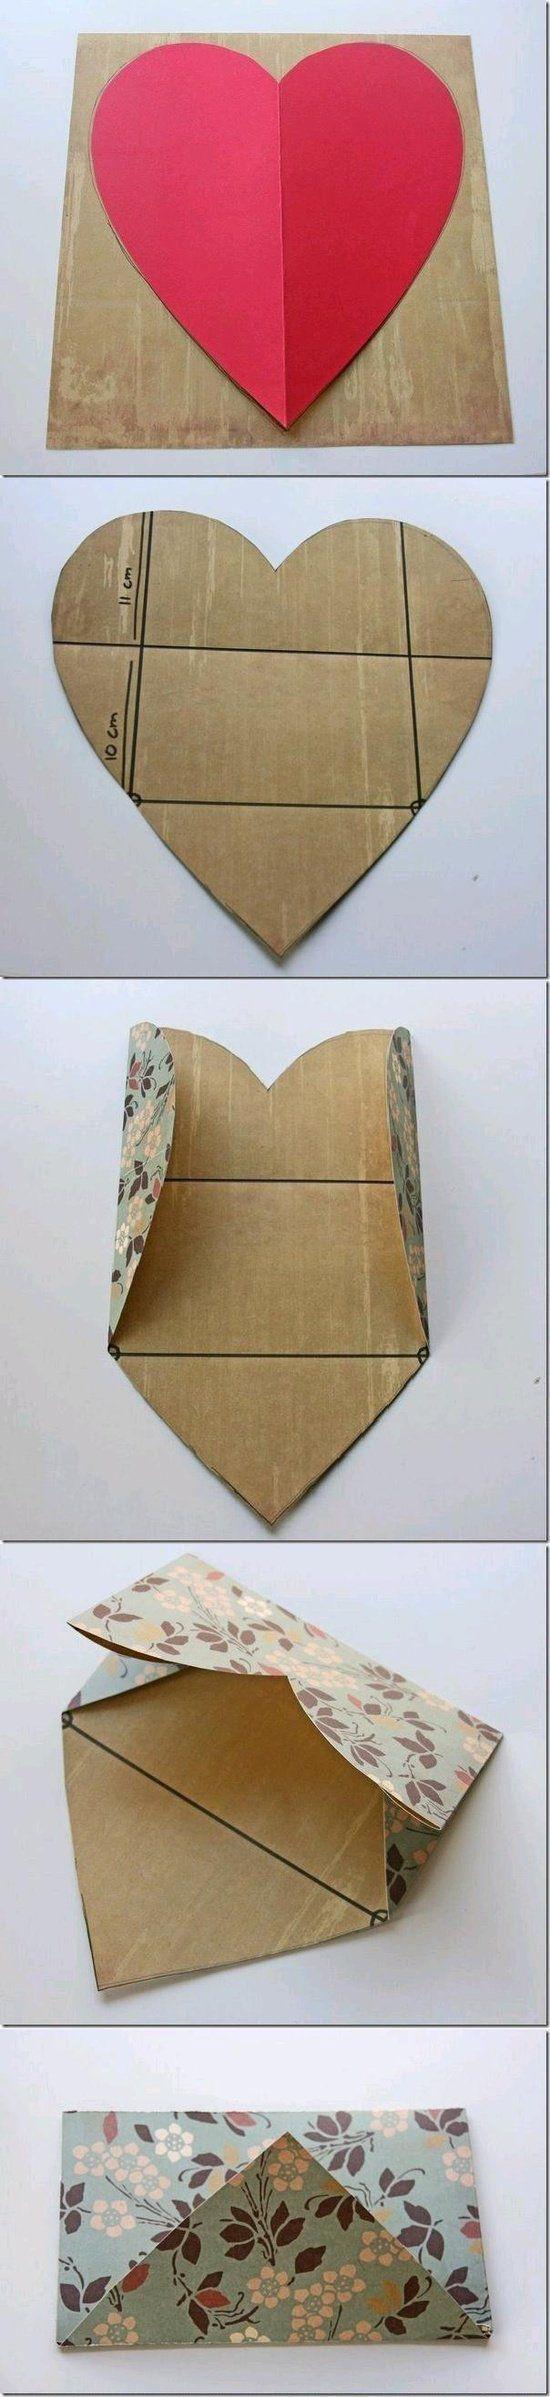 leuke verjaardag envelop knutselen en frutselen pinterest basteln geschenke und verpackung. Black Bedroom Furniture Sets. Home Design Ideas